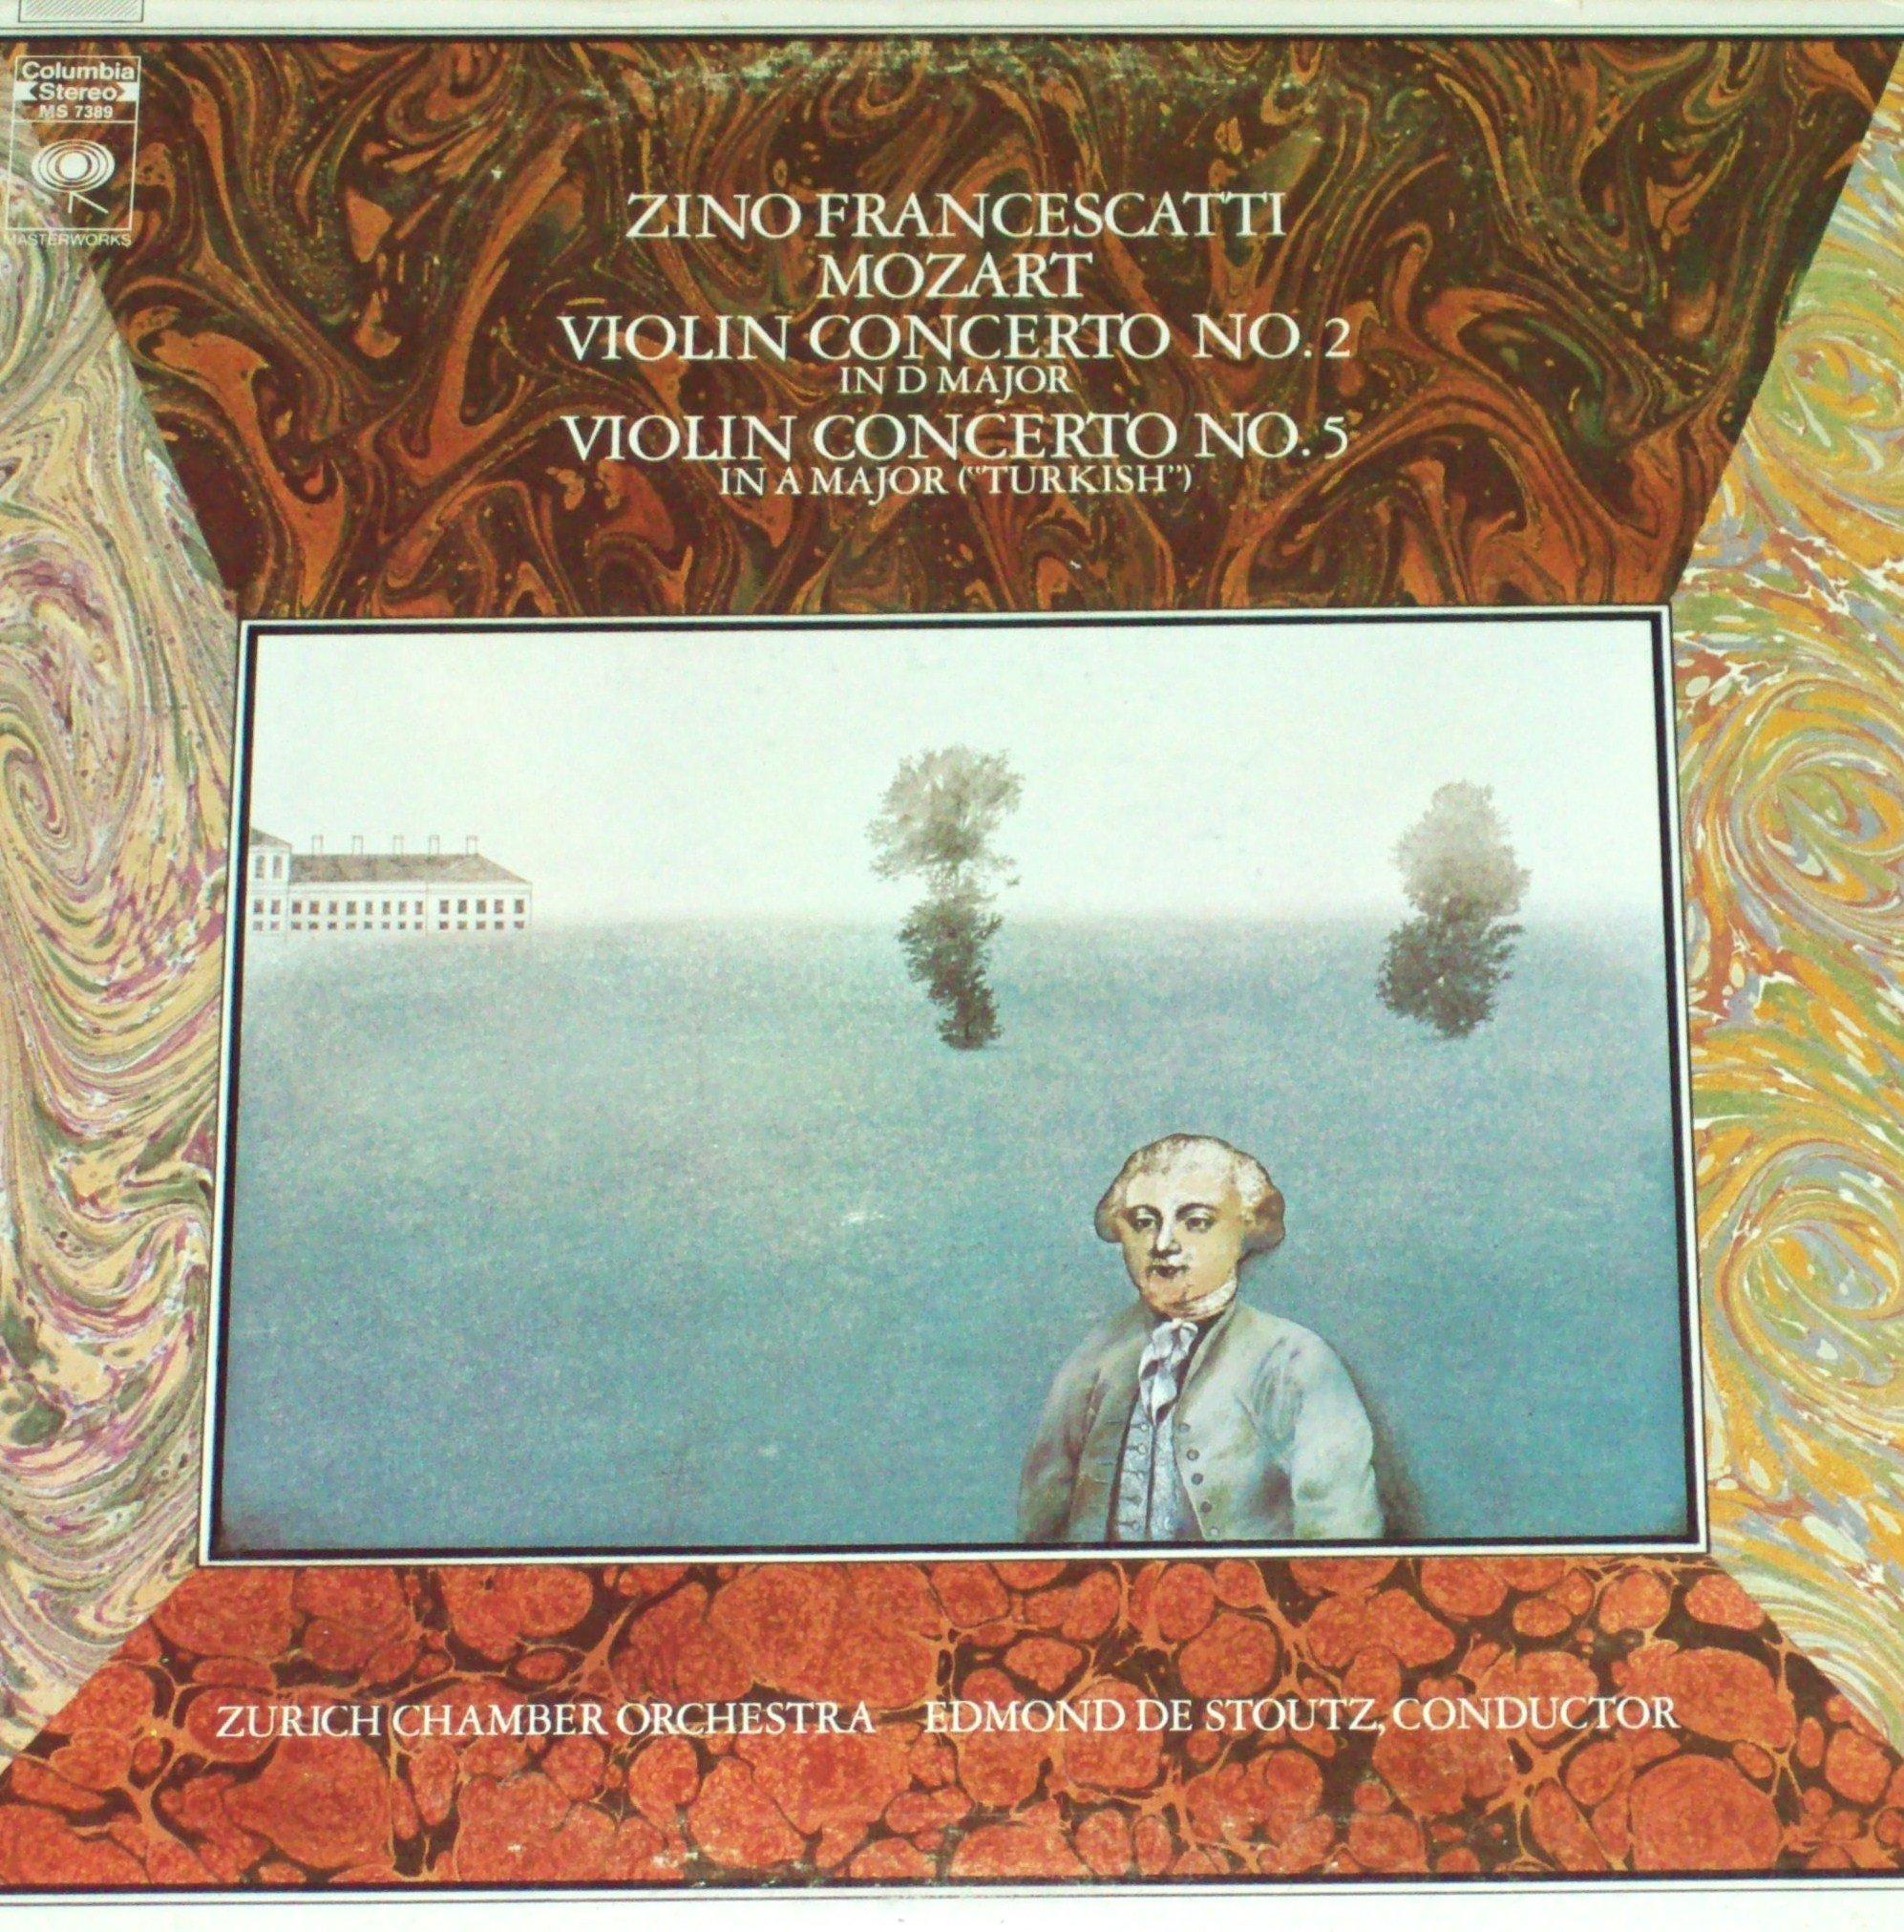 Mozart - Violin Concerto No. 2 & 5 Turkish - 12'' vinyl LP - Francescatti Columbia MS 7389 by Columbia Masterworks